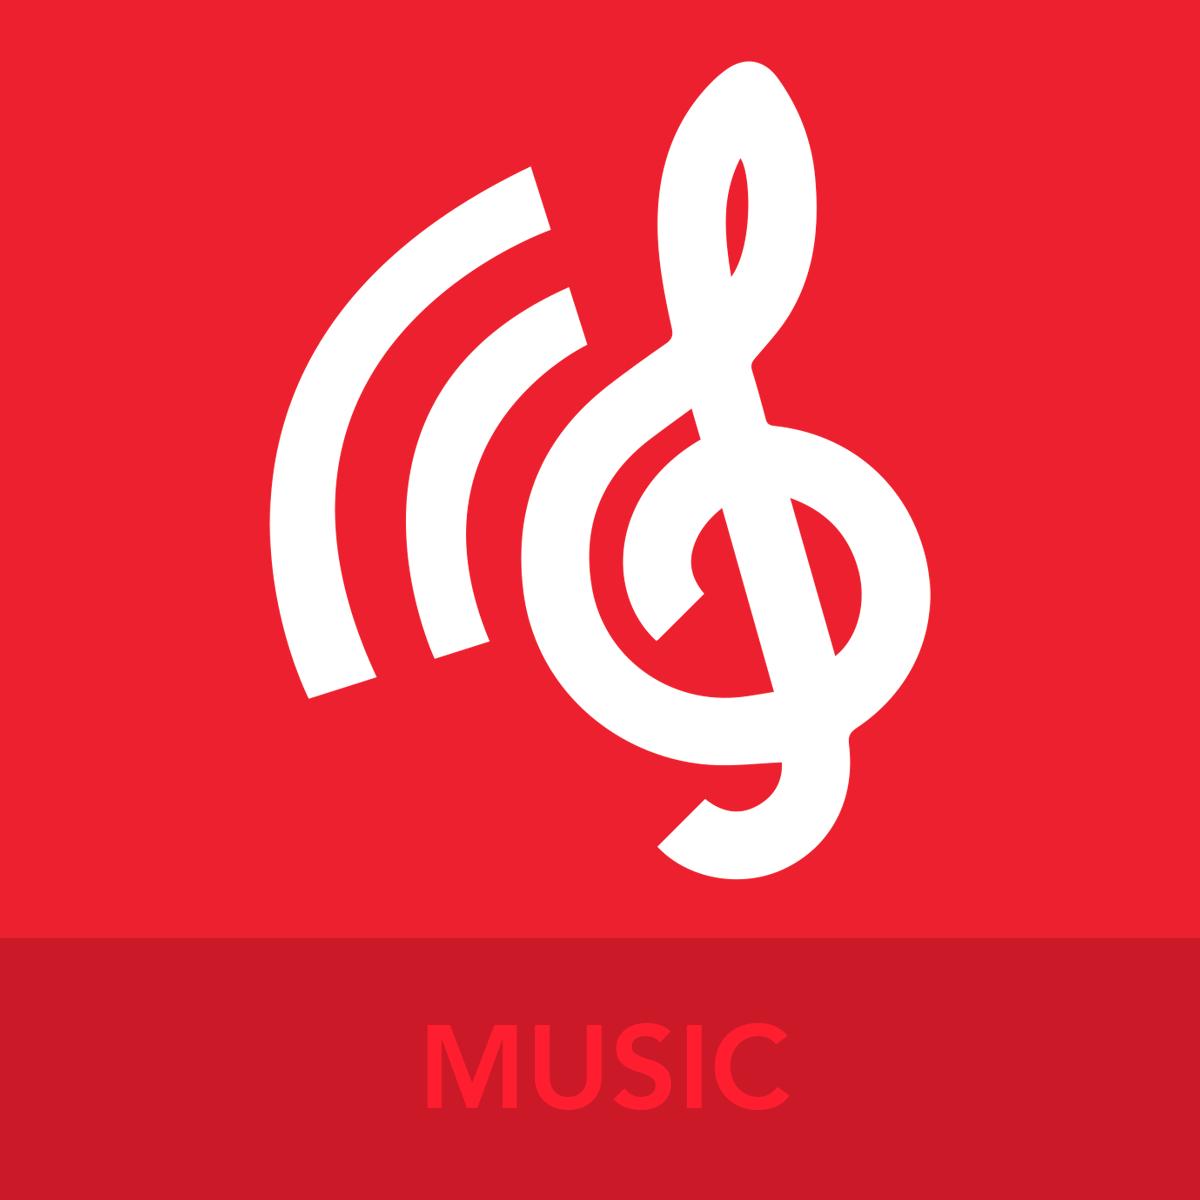 MUSIC ICON BUTTON